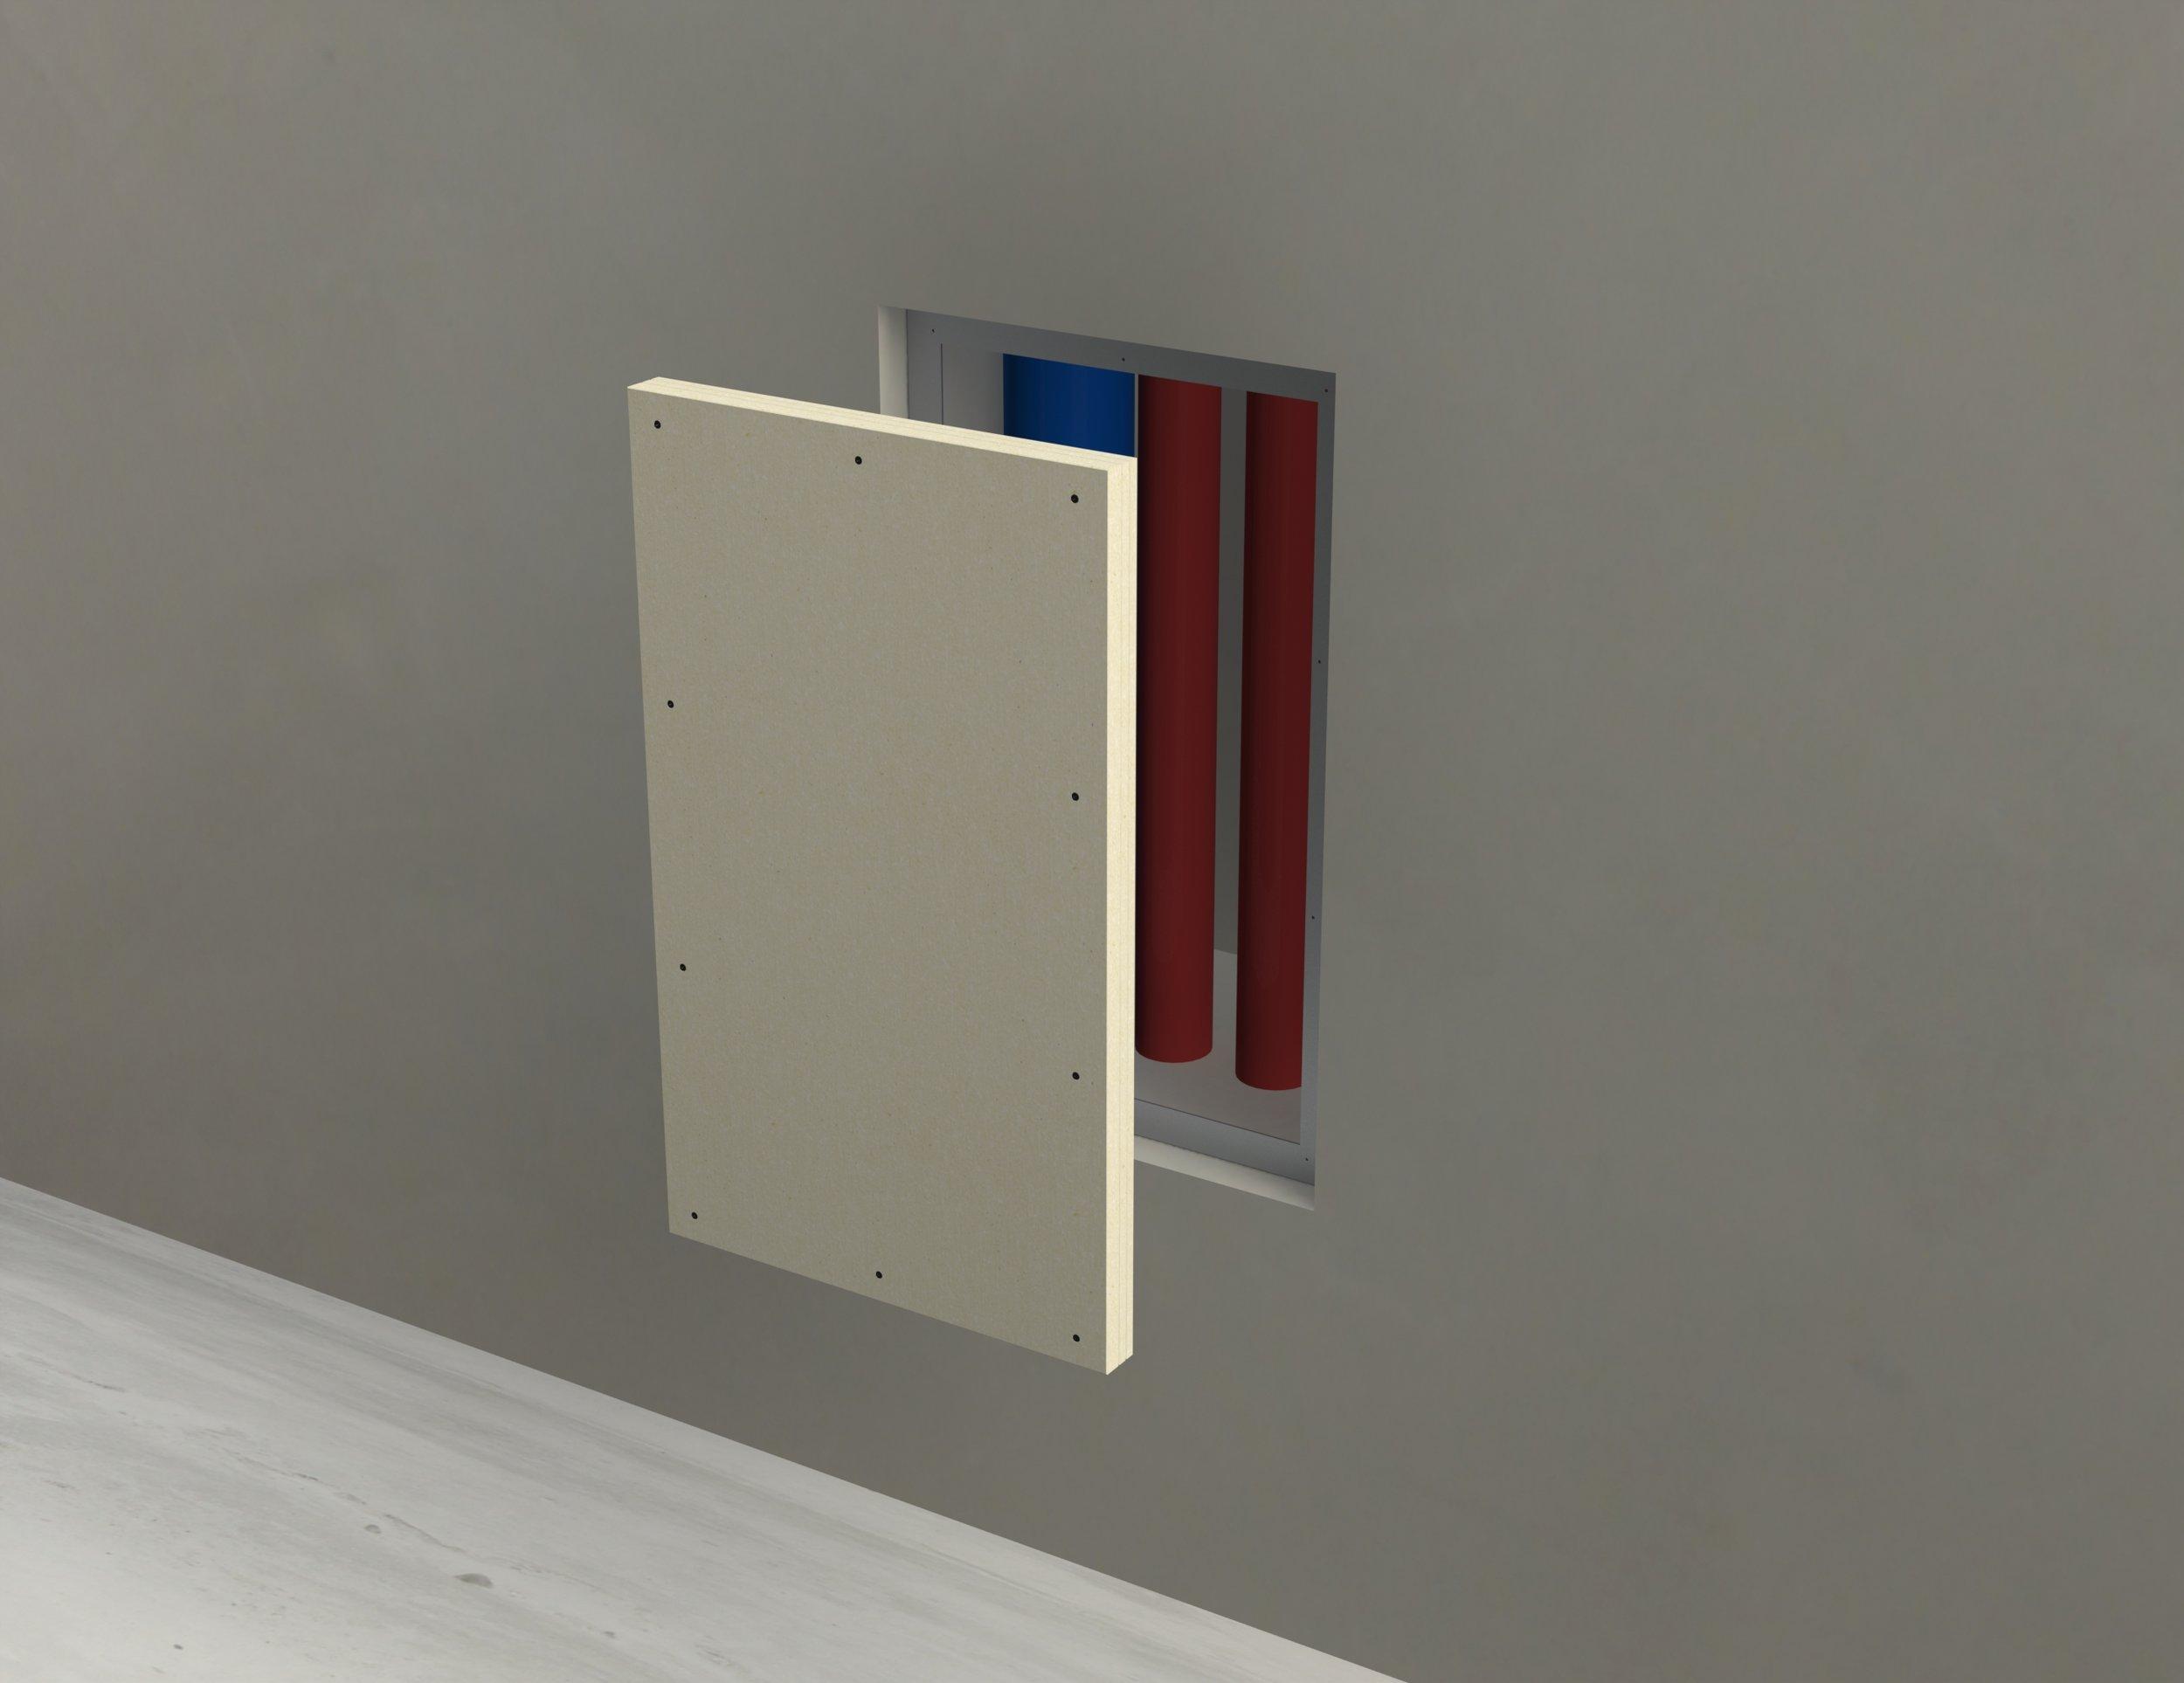 Asse FP 900 access panel 2 C3 B.JPG